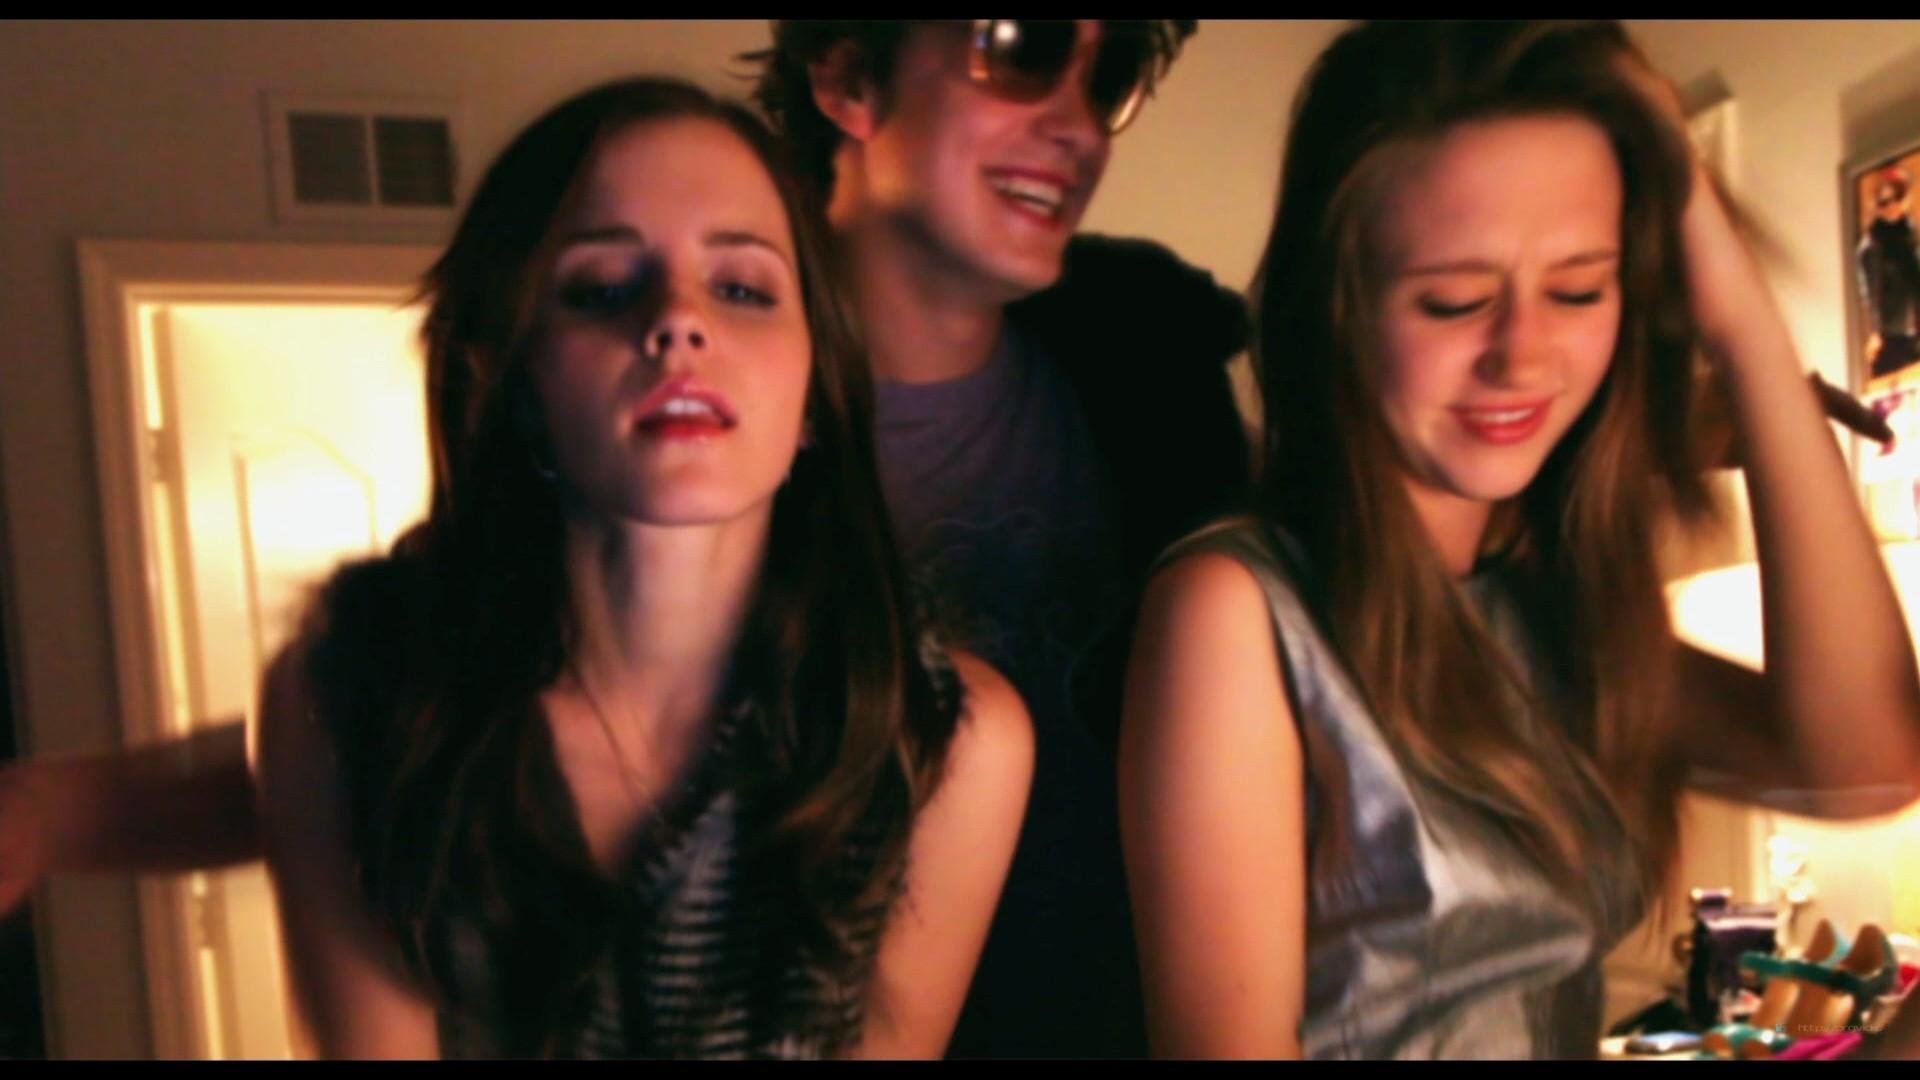 Emma Watson hot Taissa Farmiga and others sexy - The Bling Ring (2013) HD 1080p BluRay (9)